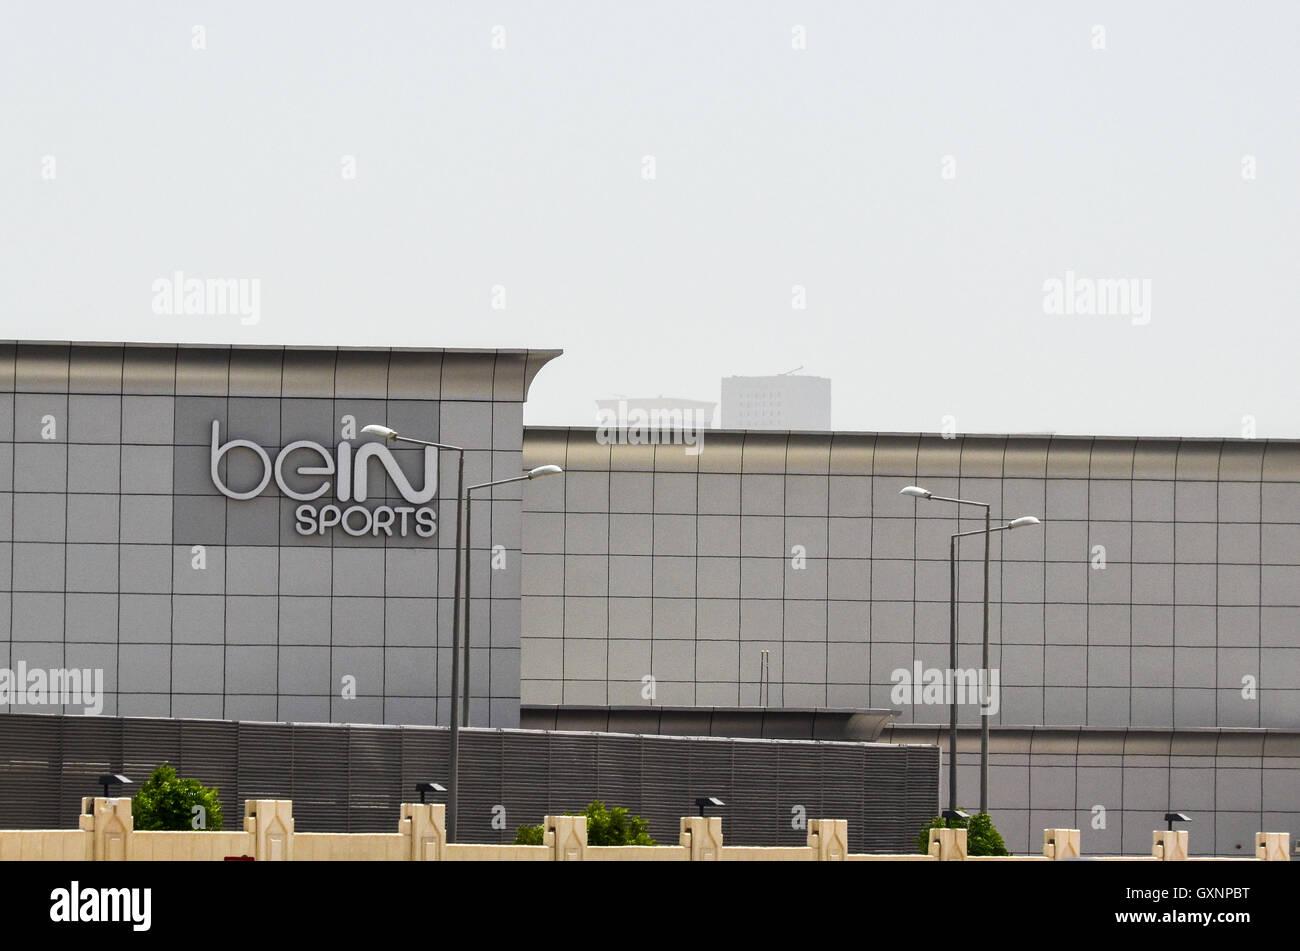 Sede de beIN canal deportes deporte en Doha, Qatar Imagen De Stock